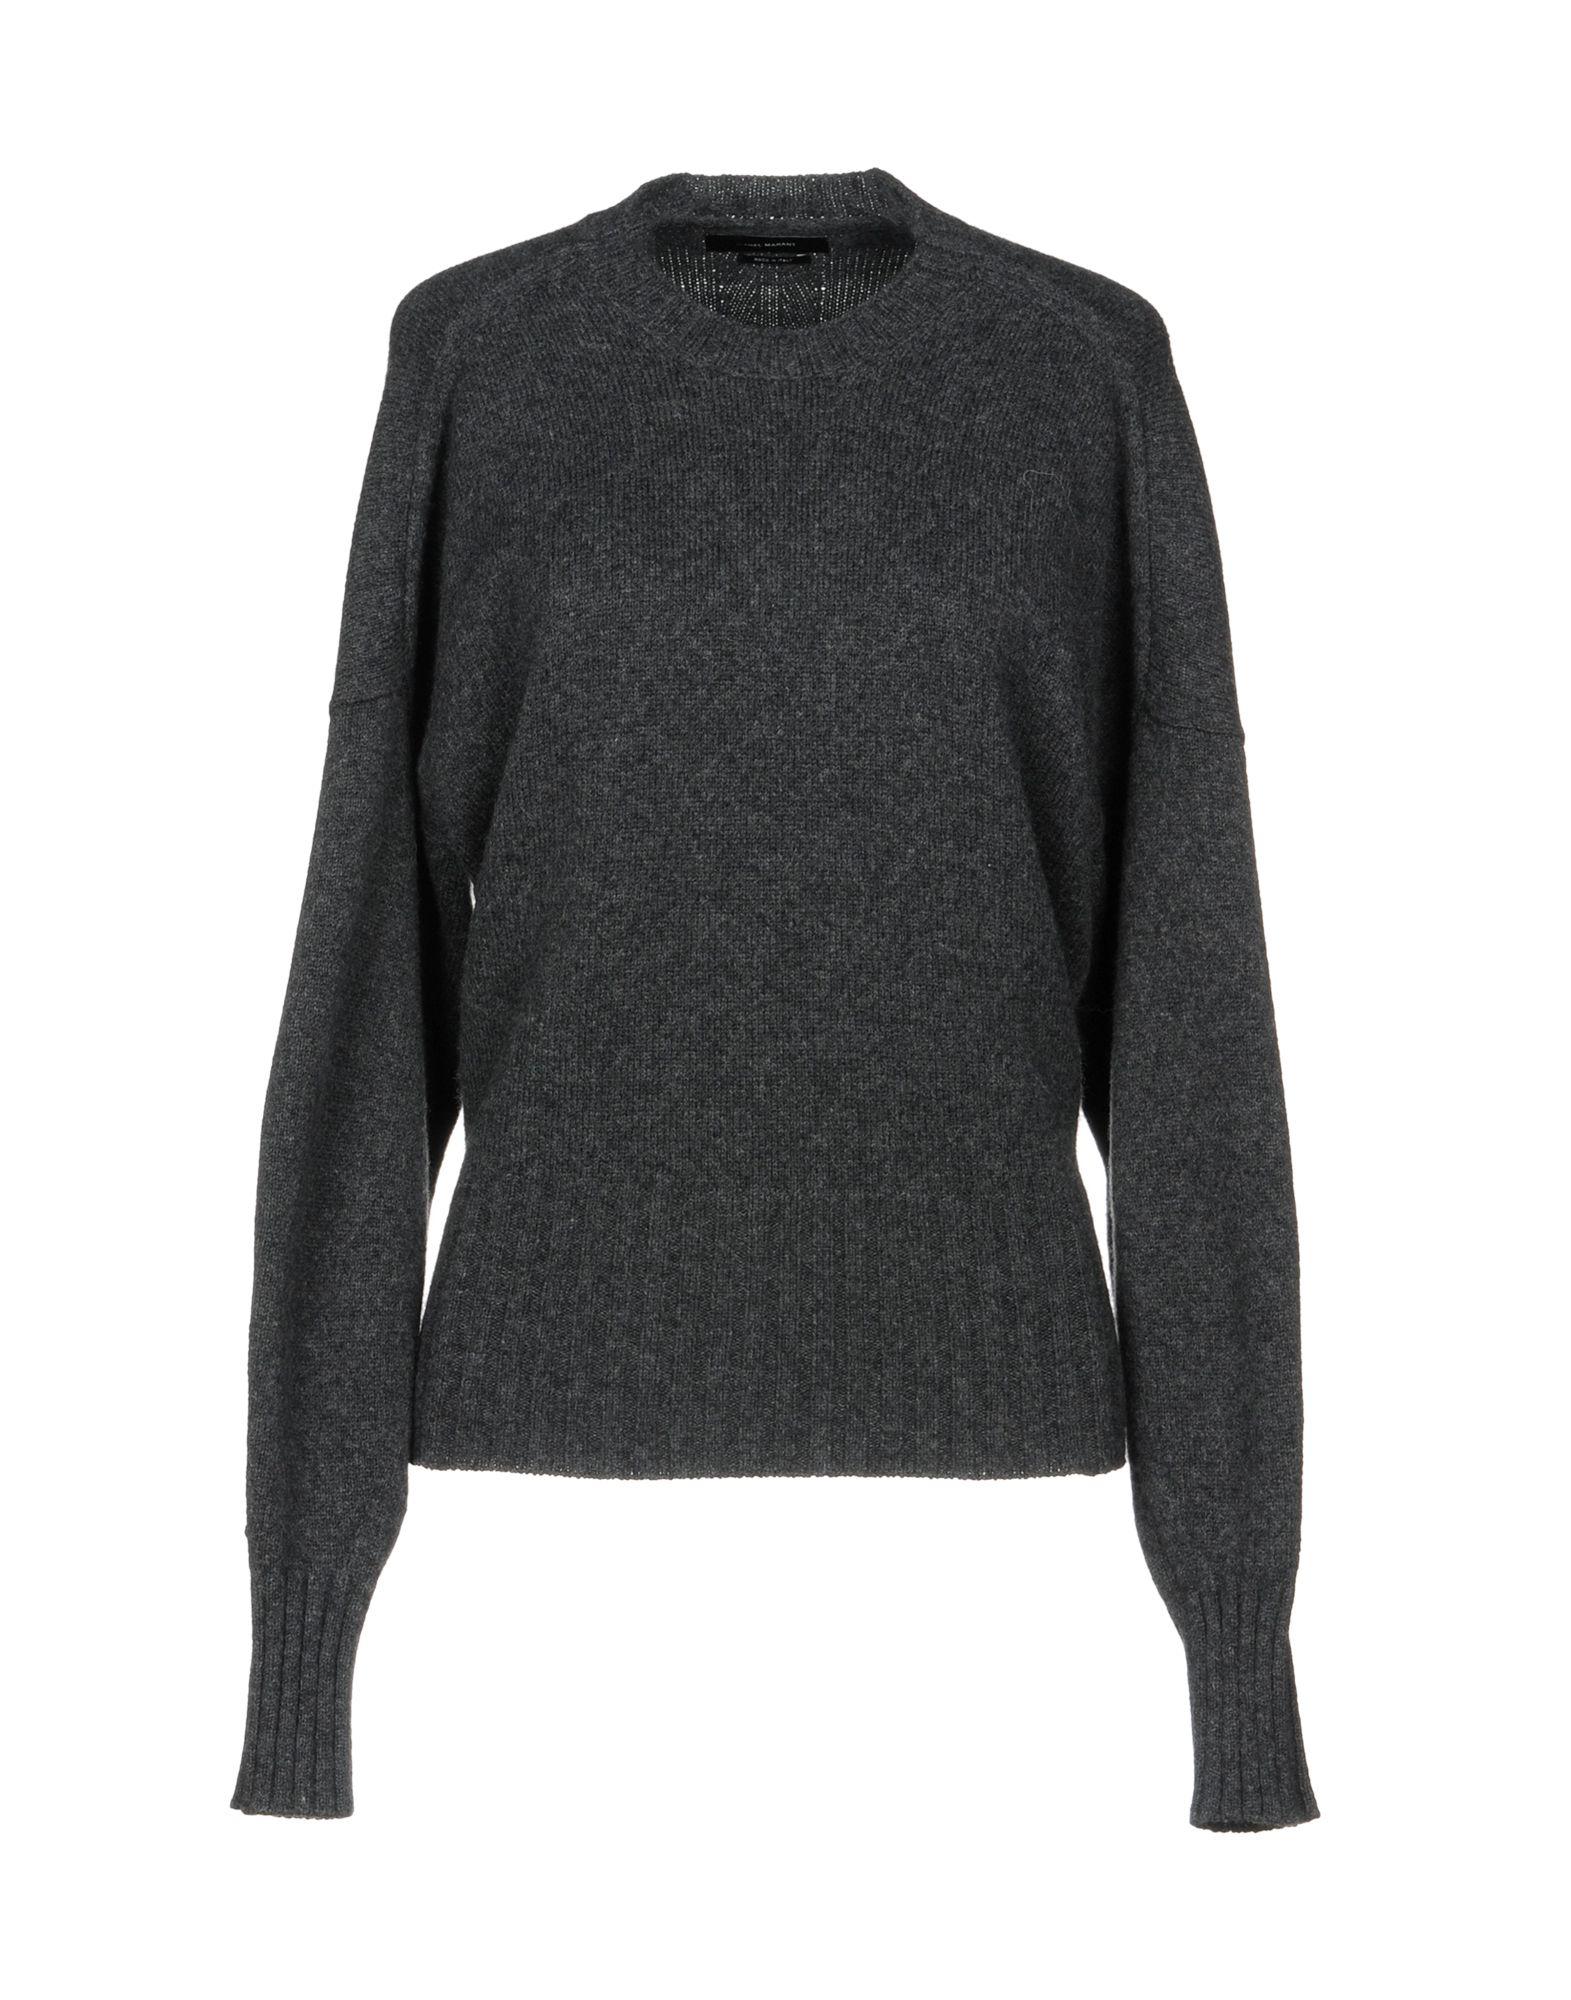 Pullover Isabel Marant Donna - Acquista online su 7YOhnb7